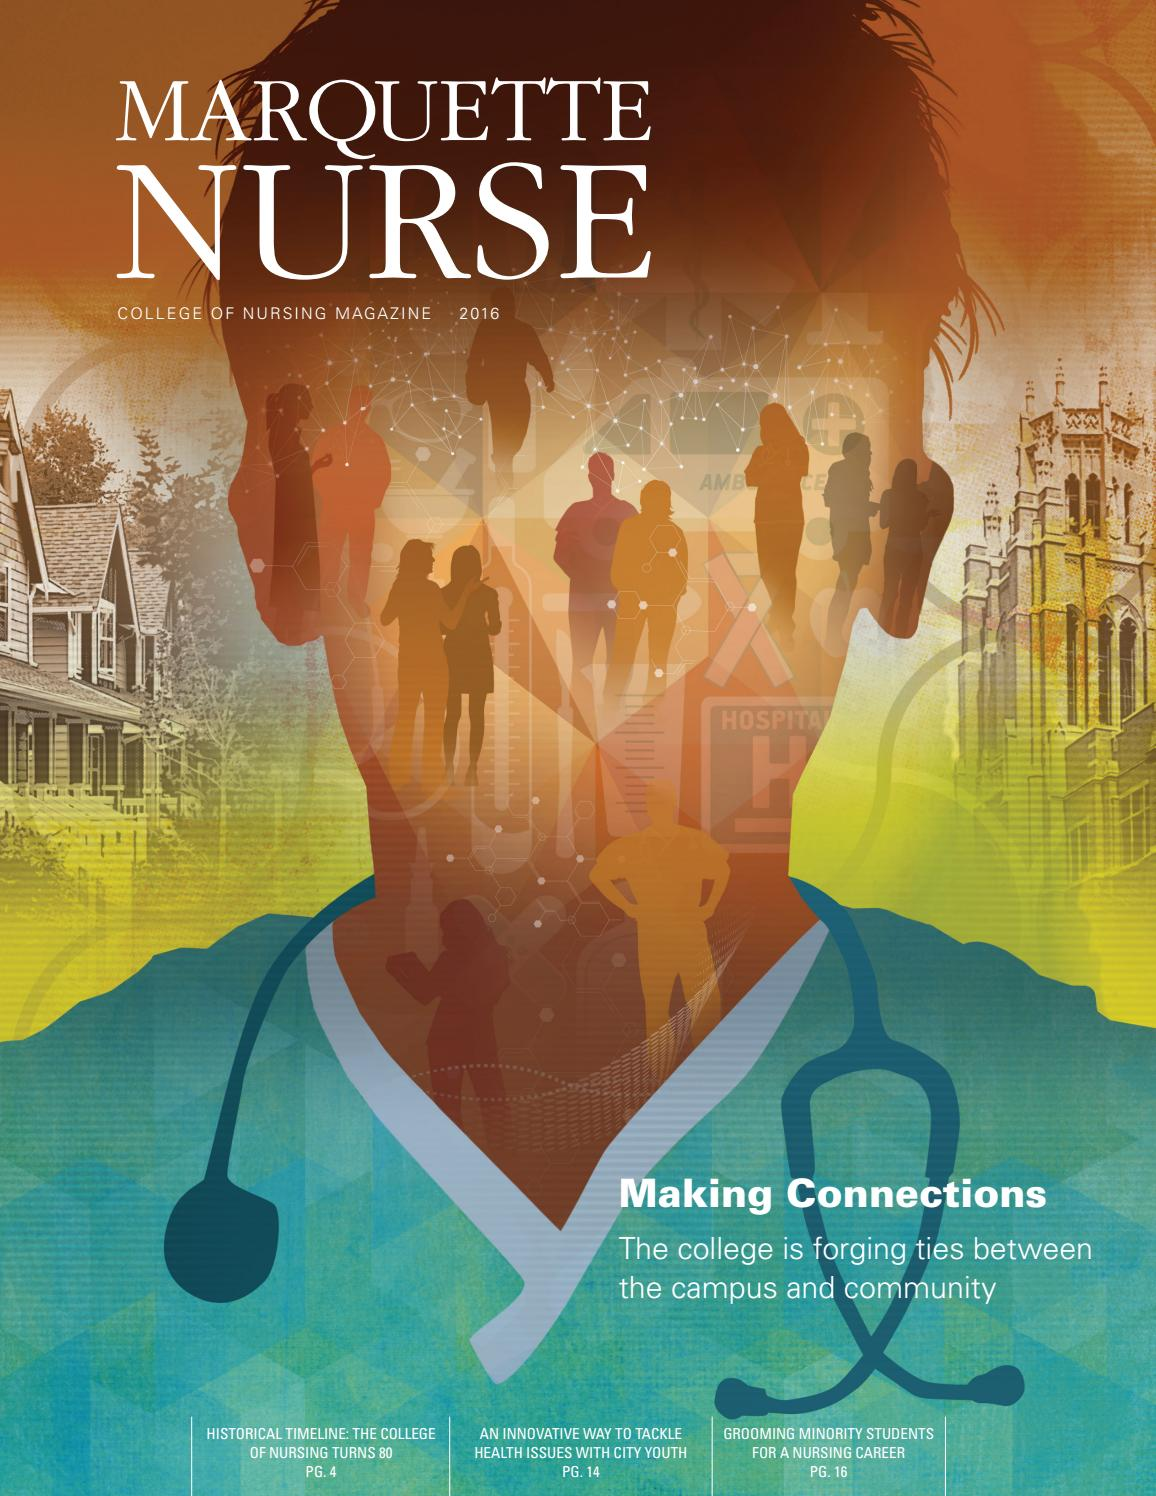 Marquette Nurse 2016 By Marquette University   Issuu